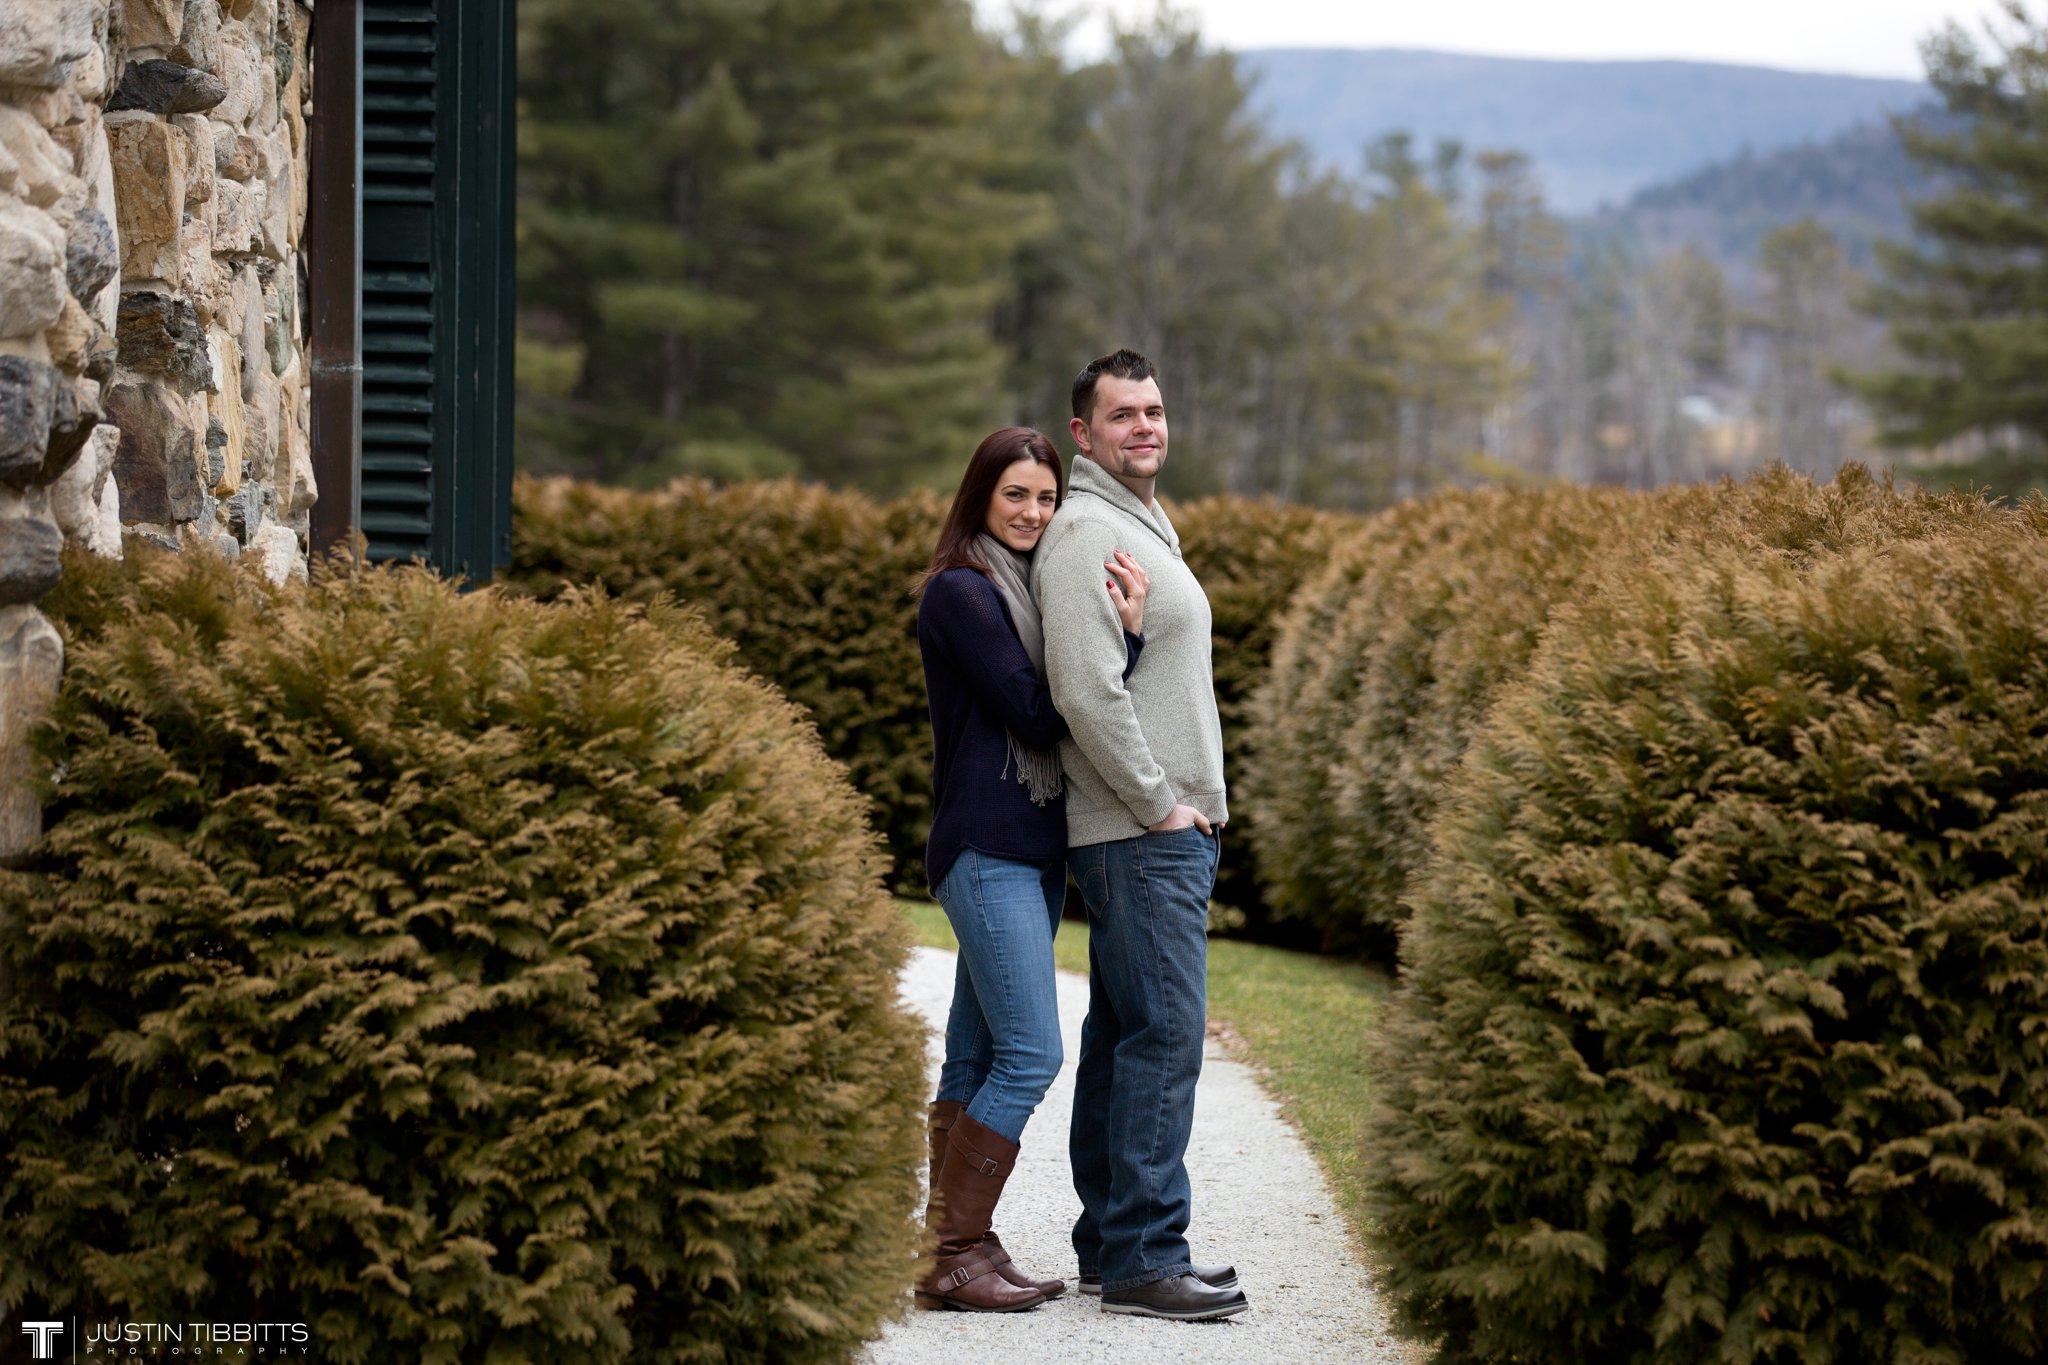 Lauren and Jordan's Engagement Photos at The Mount, Lenox,MA_0009